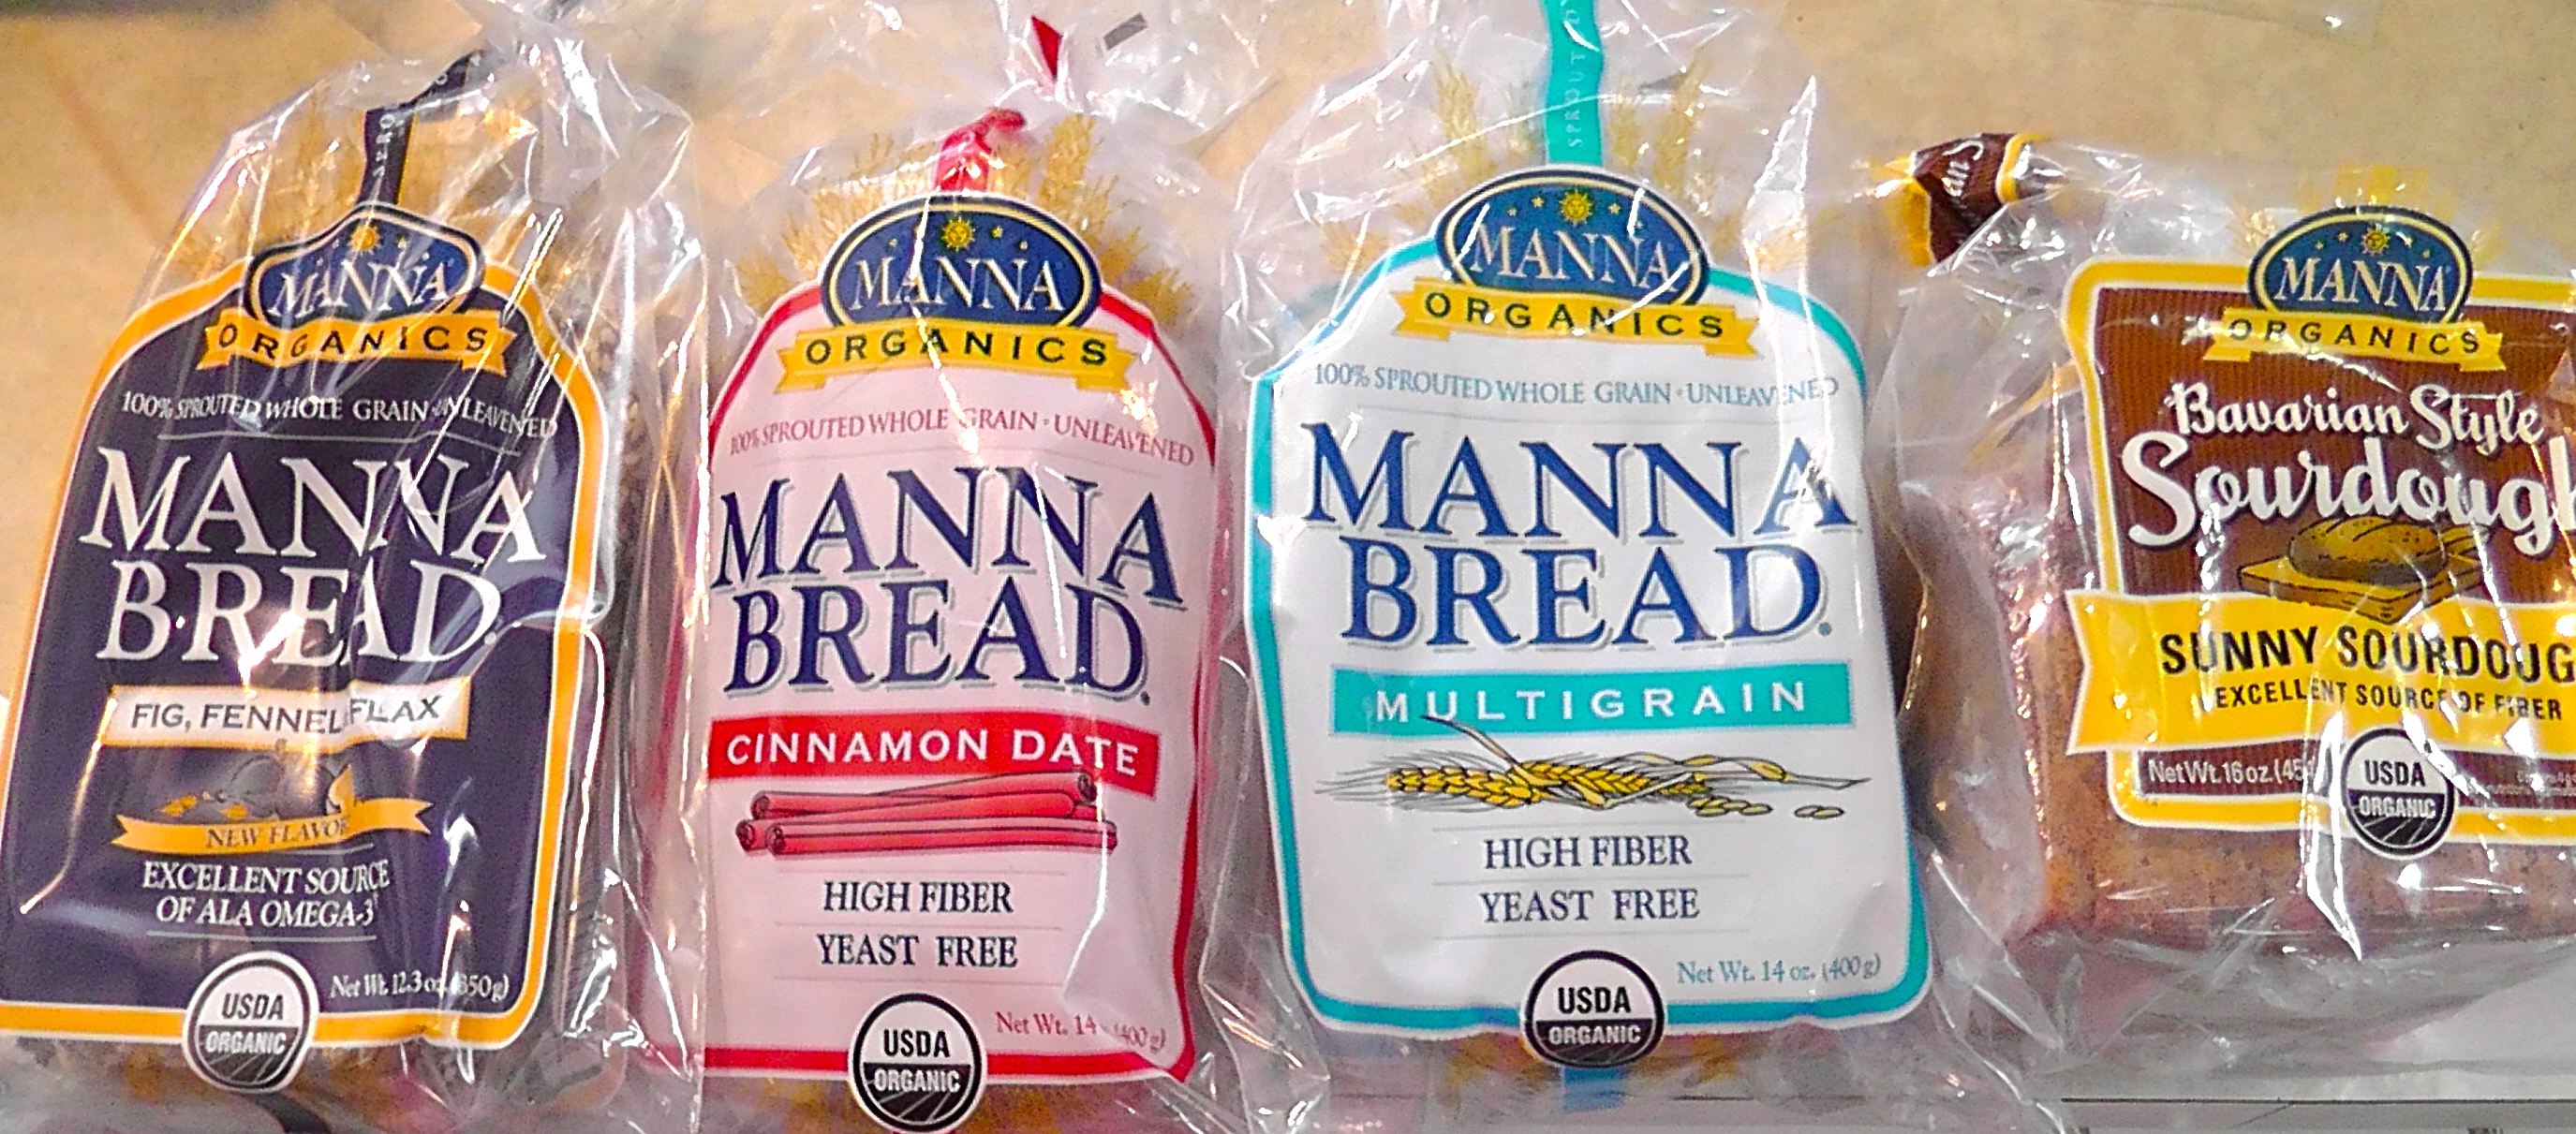 manna-bread